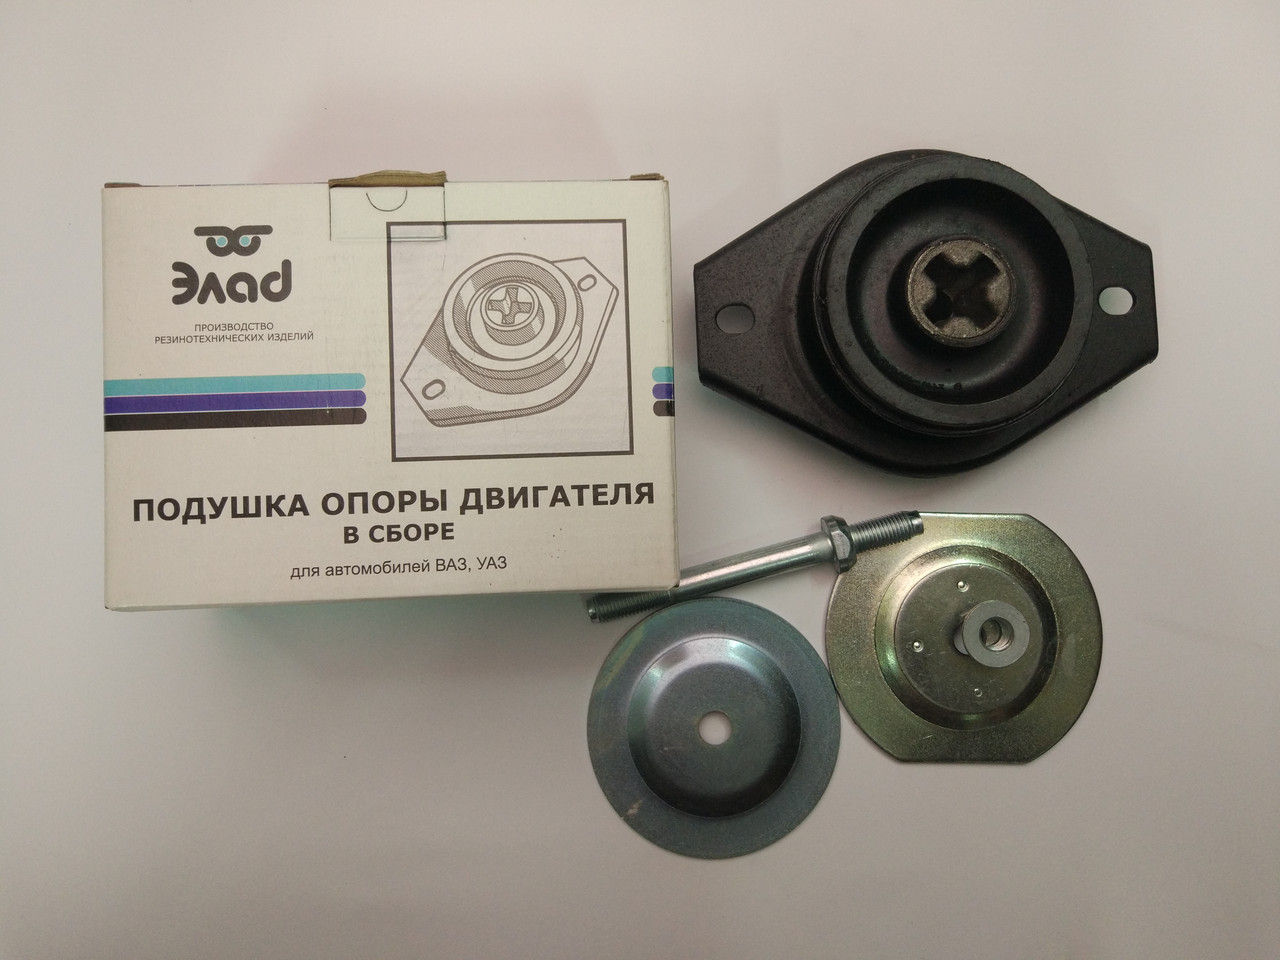 Подушка двигателя (2110) ЭЛАД верх.лива